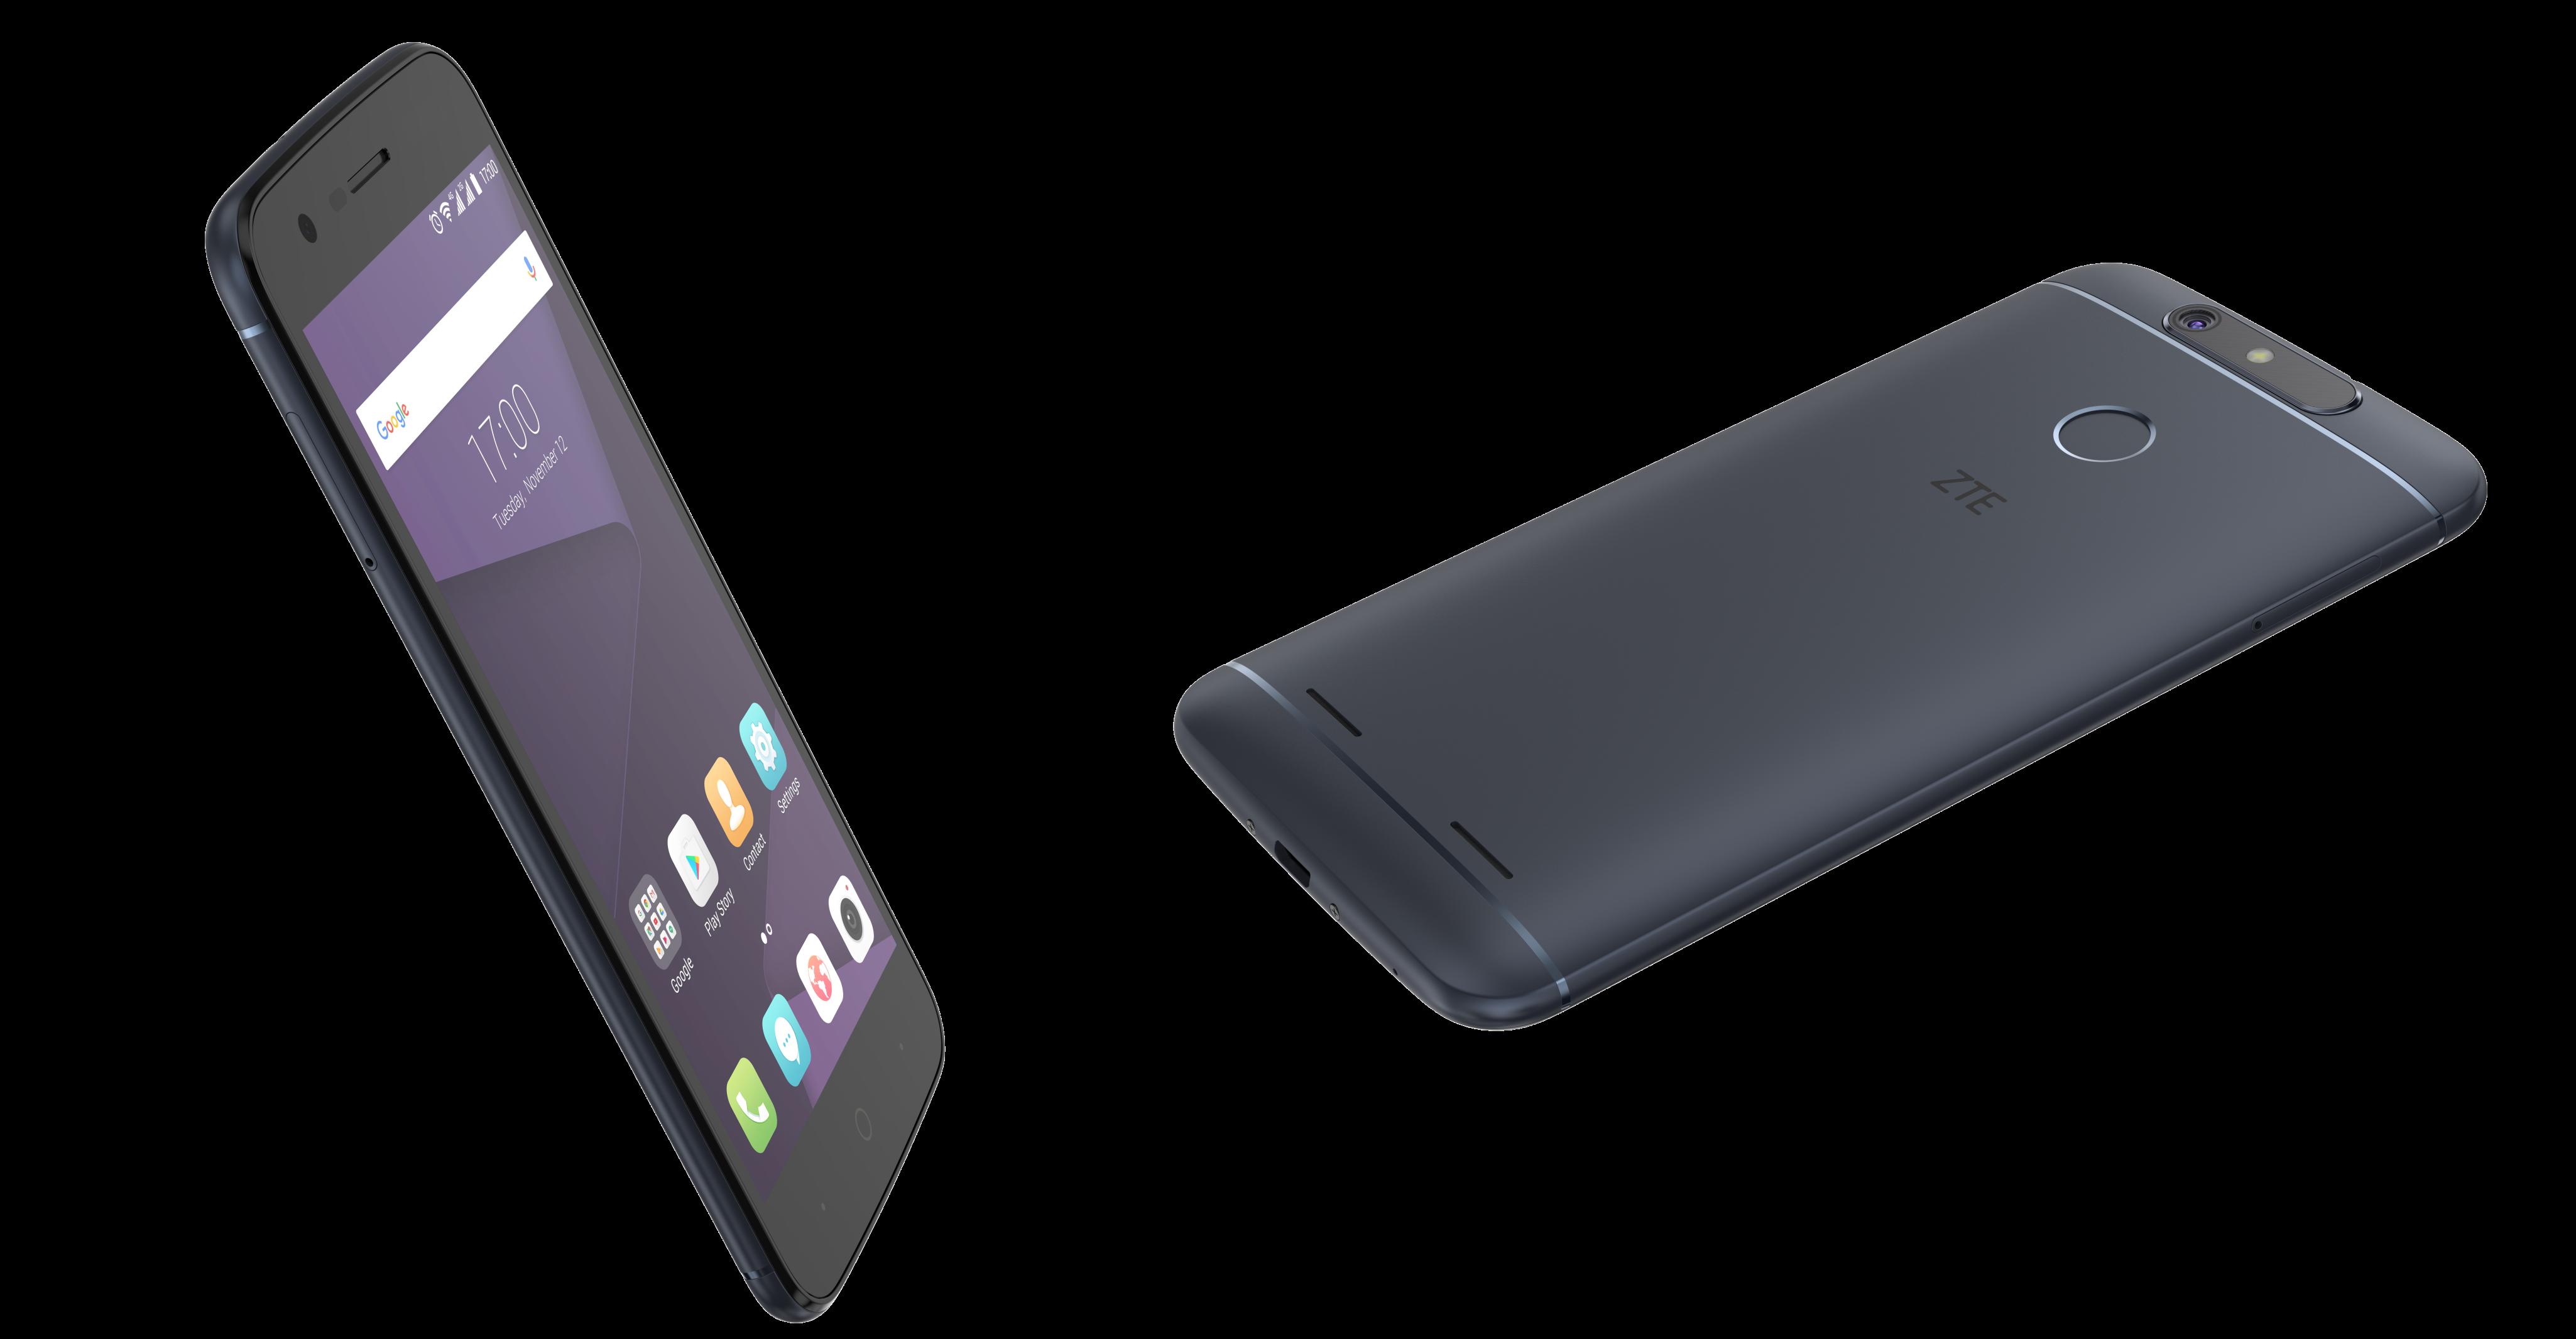 ZTE expands affordable range with Blade V8 Mini, Lite phones